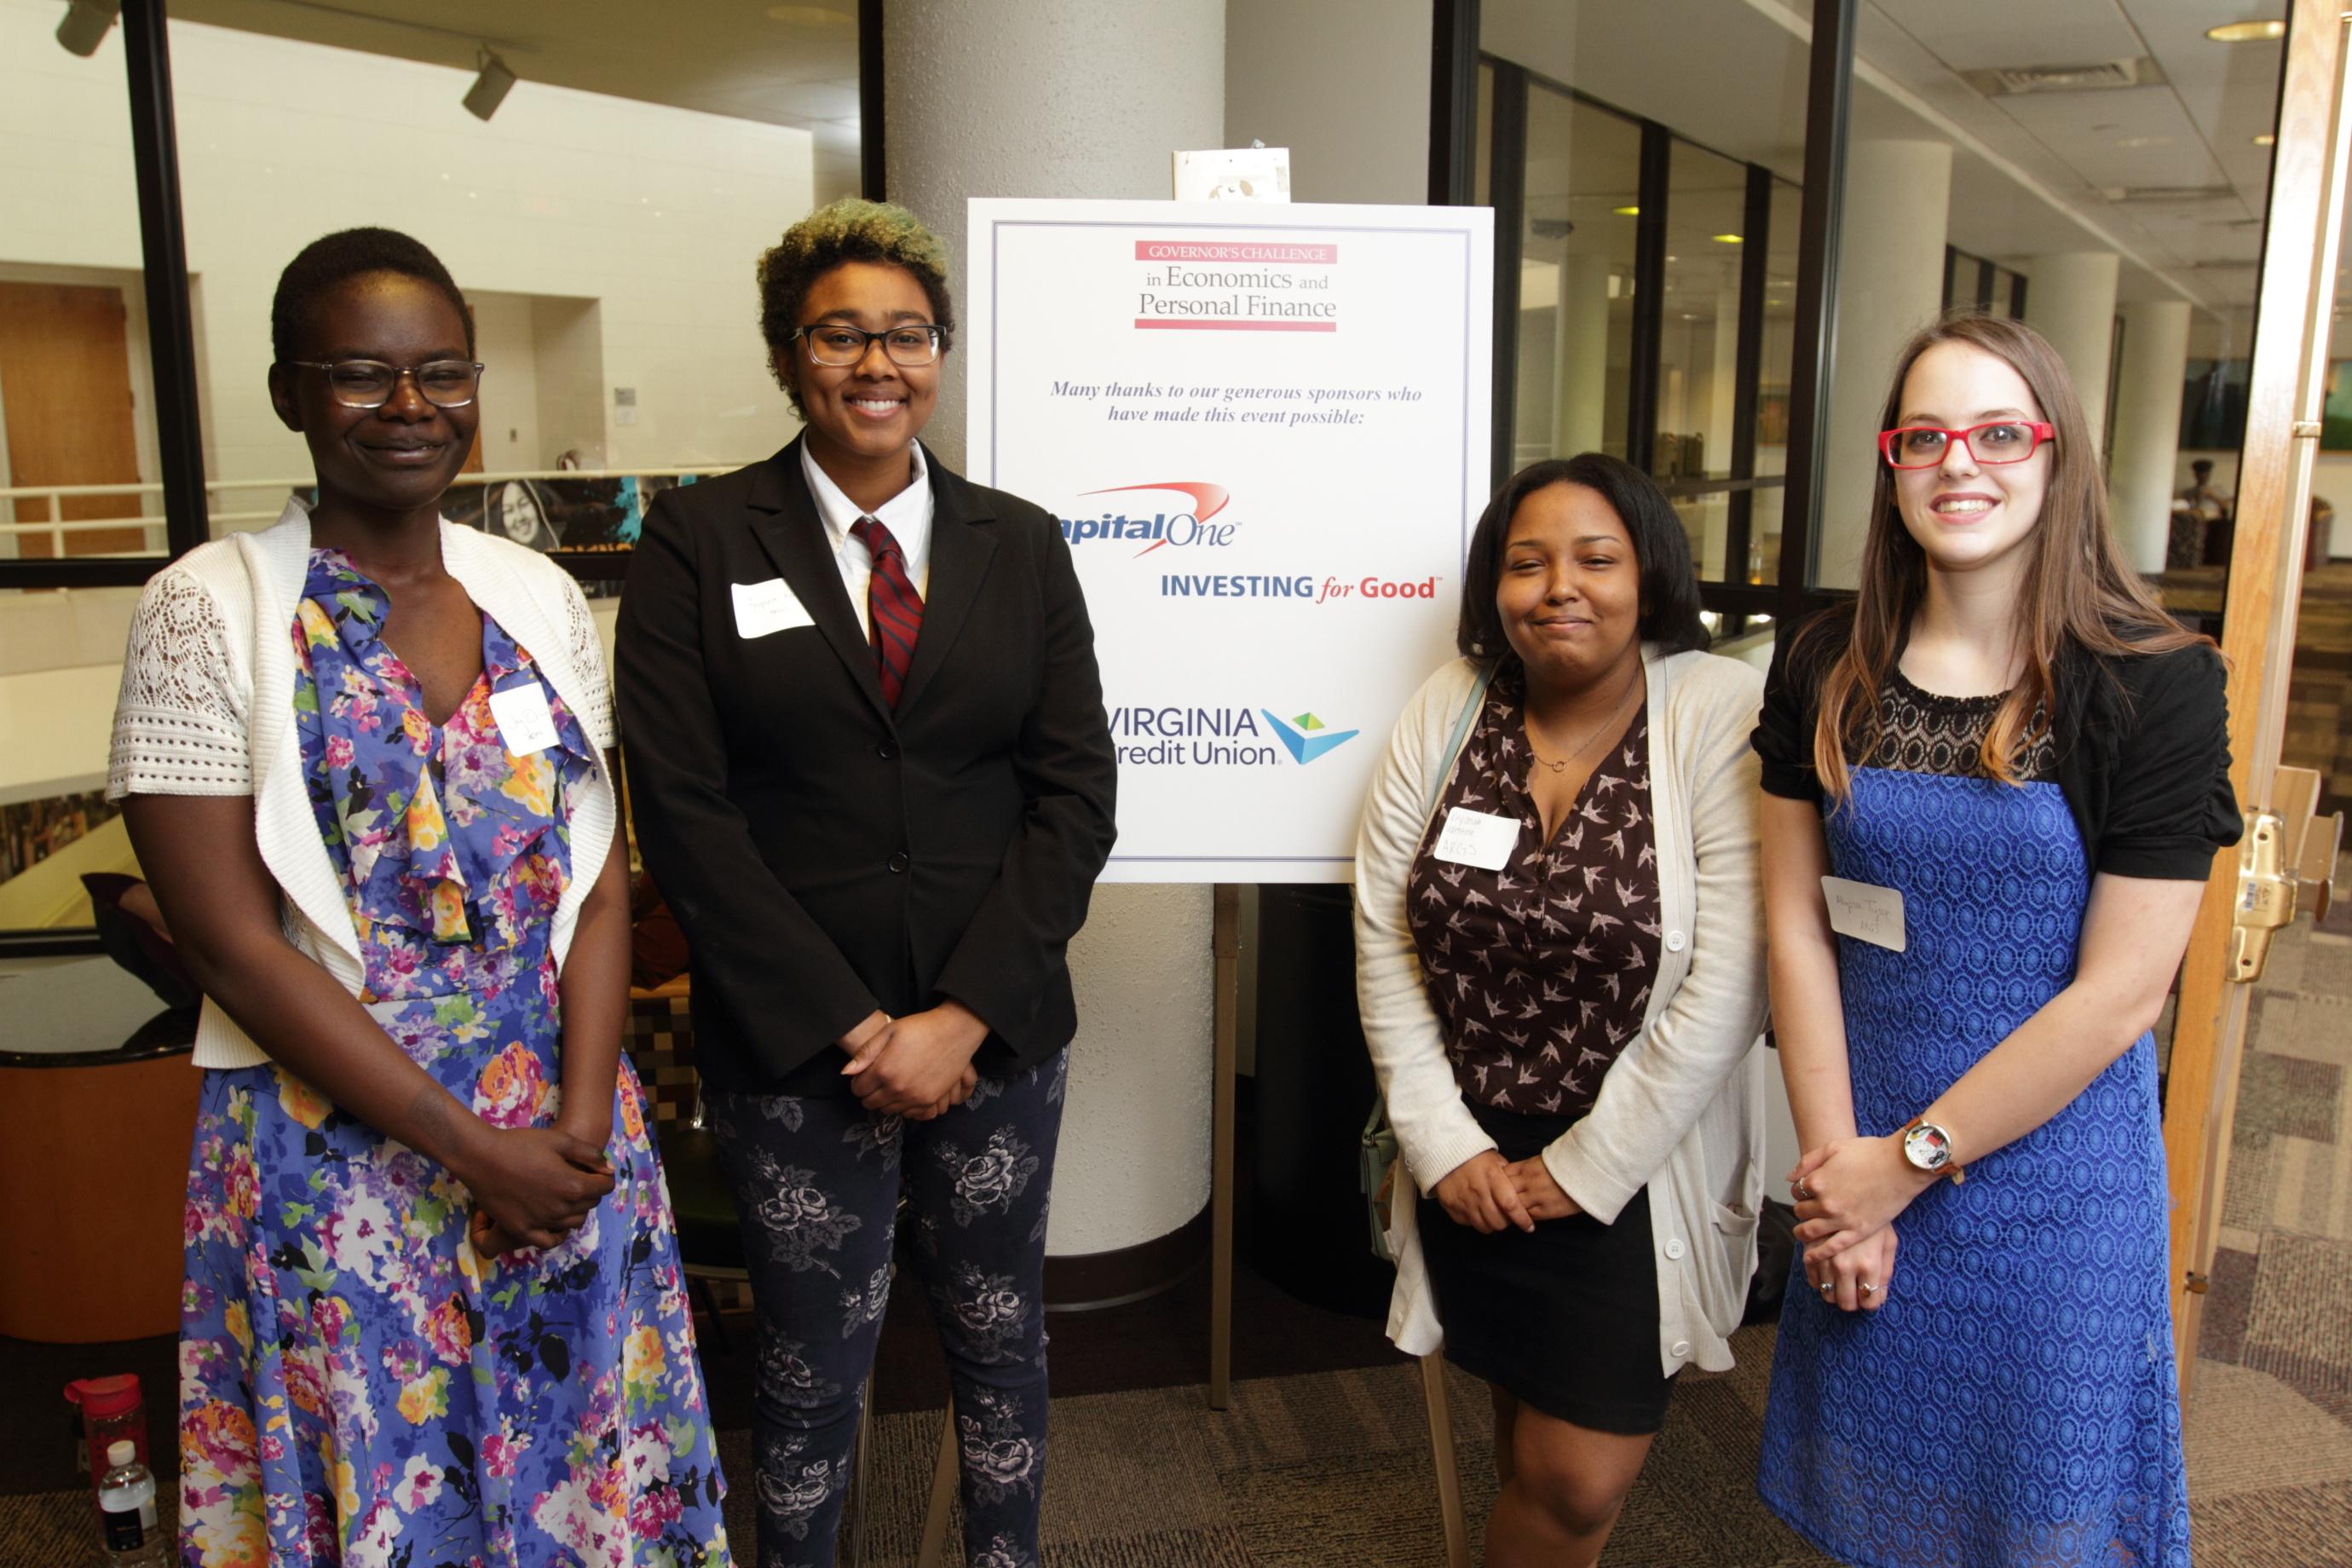 Appomattox Regional Governor's School for Arts and technology - L-R: Joy Ochieng, Ariyana Woody, Keyanah Valentine, and Alyssa Tyson